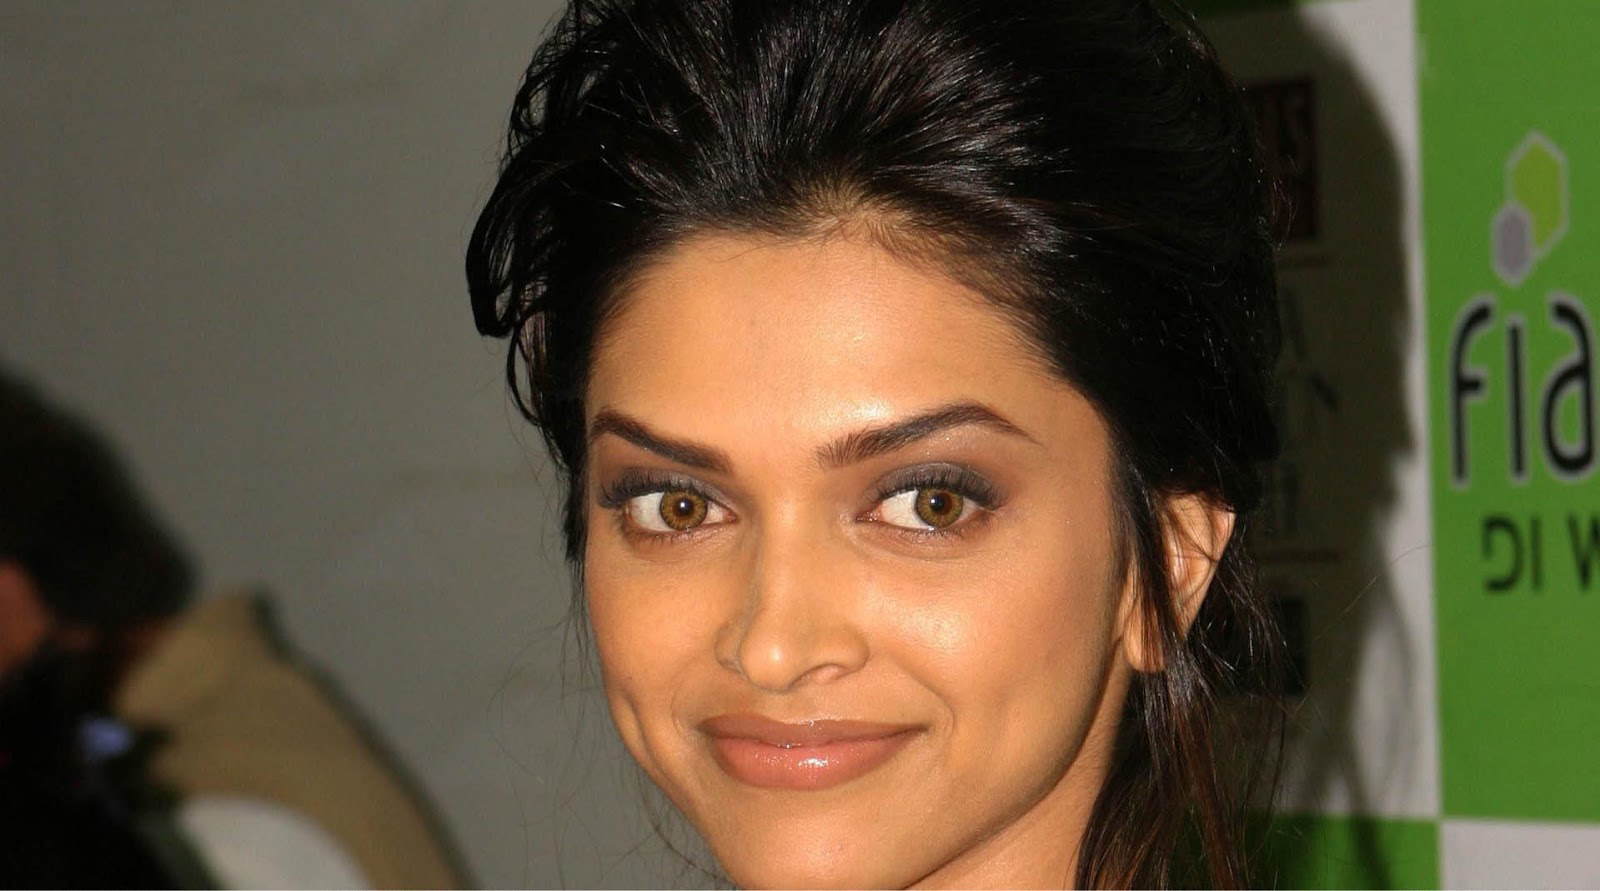 bollywood actress deepika padukone,deepika padukone hot and kiss